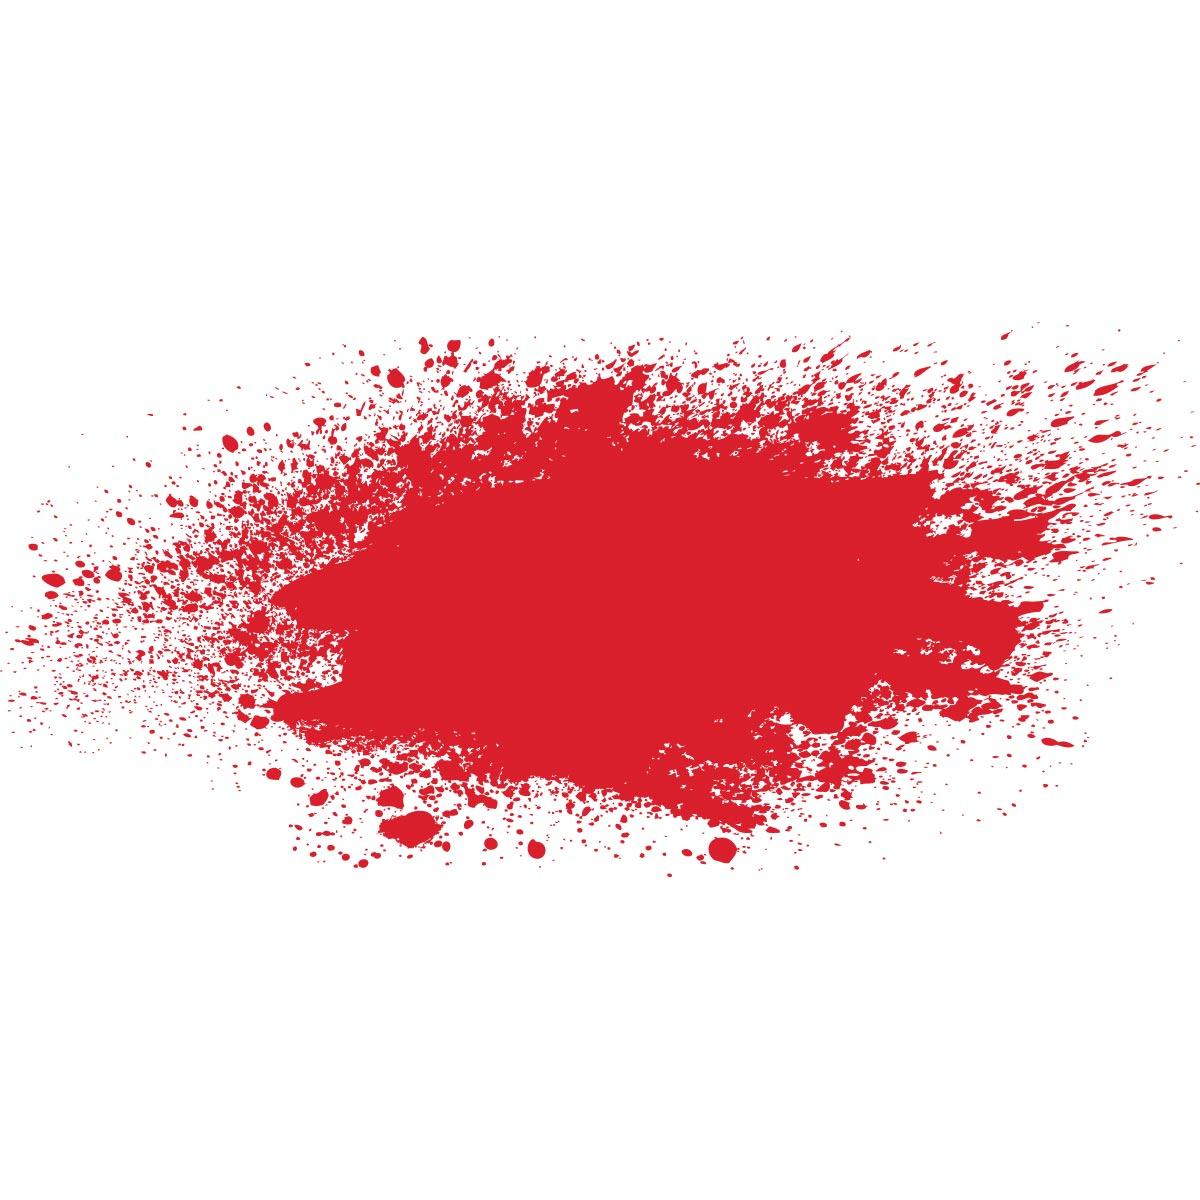 FolkArt ® Stencil Spray™ Acrylic Paint - Bright Red, 2 oz.